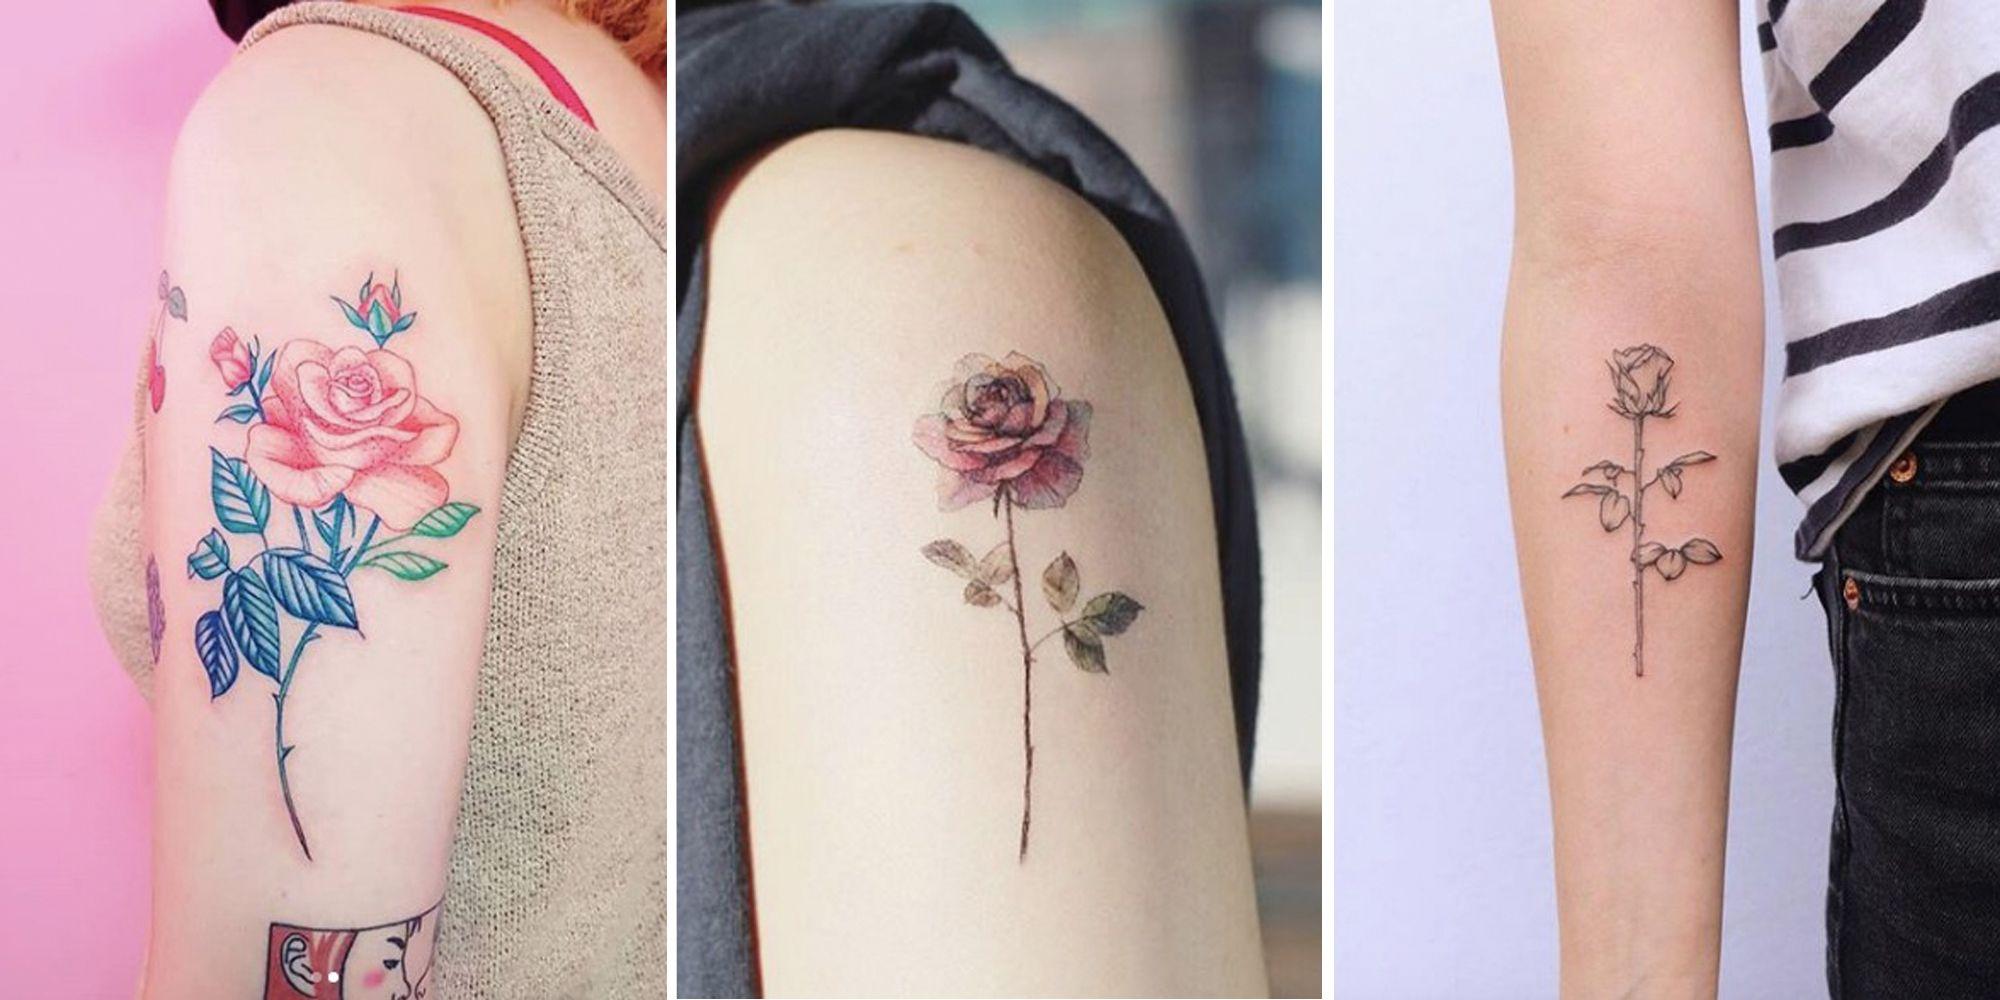 16 Delicate Flower Tattoos Flower Tattoo Ideas Inspiration